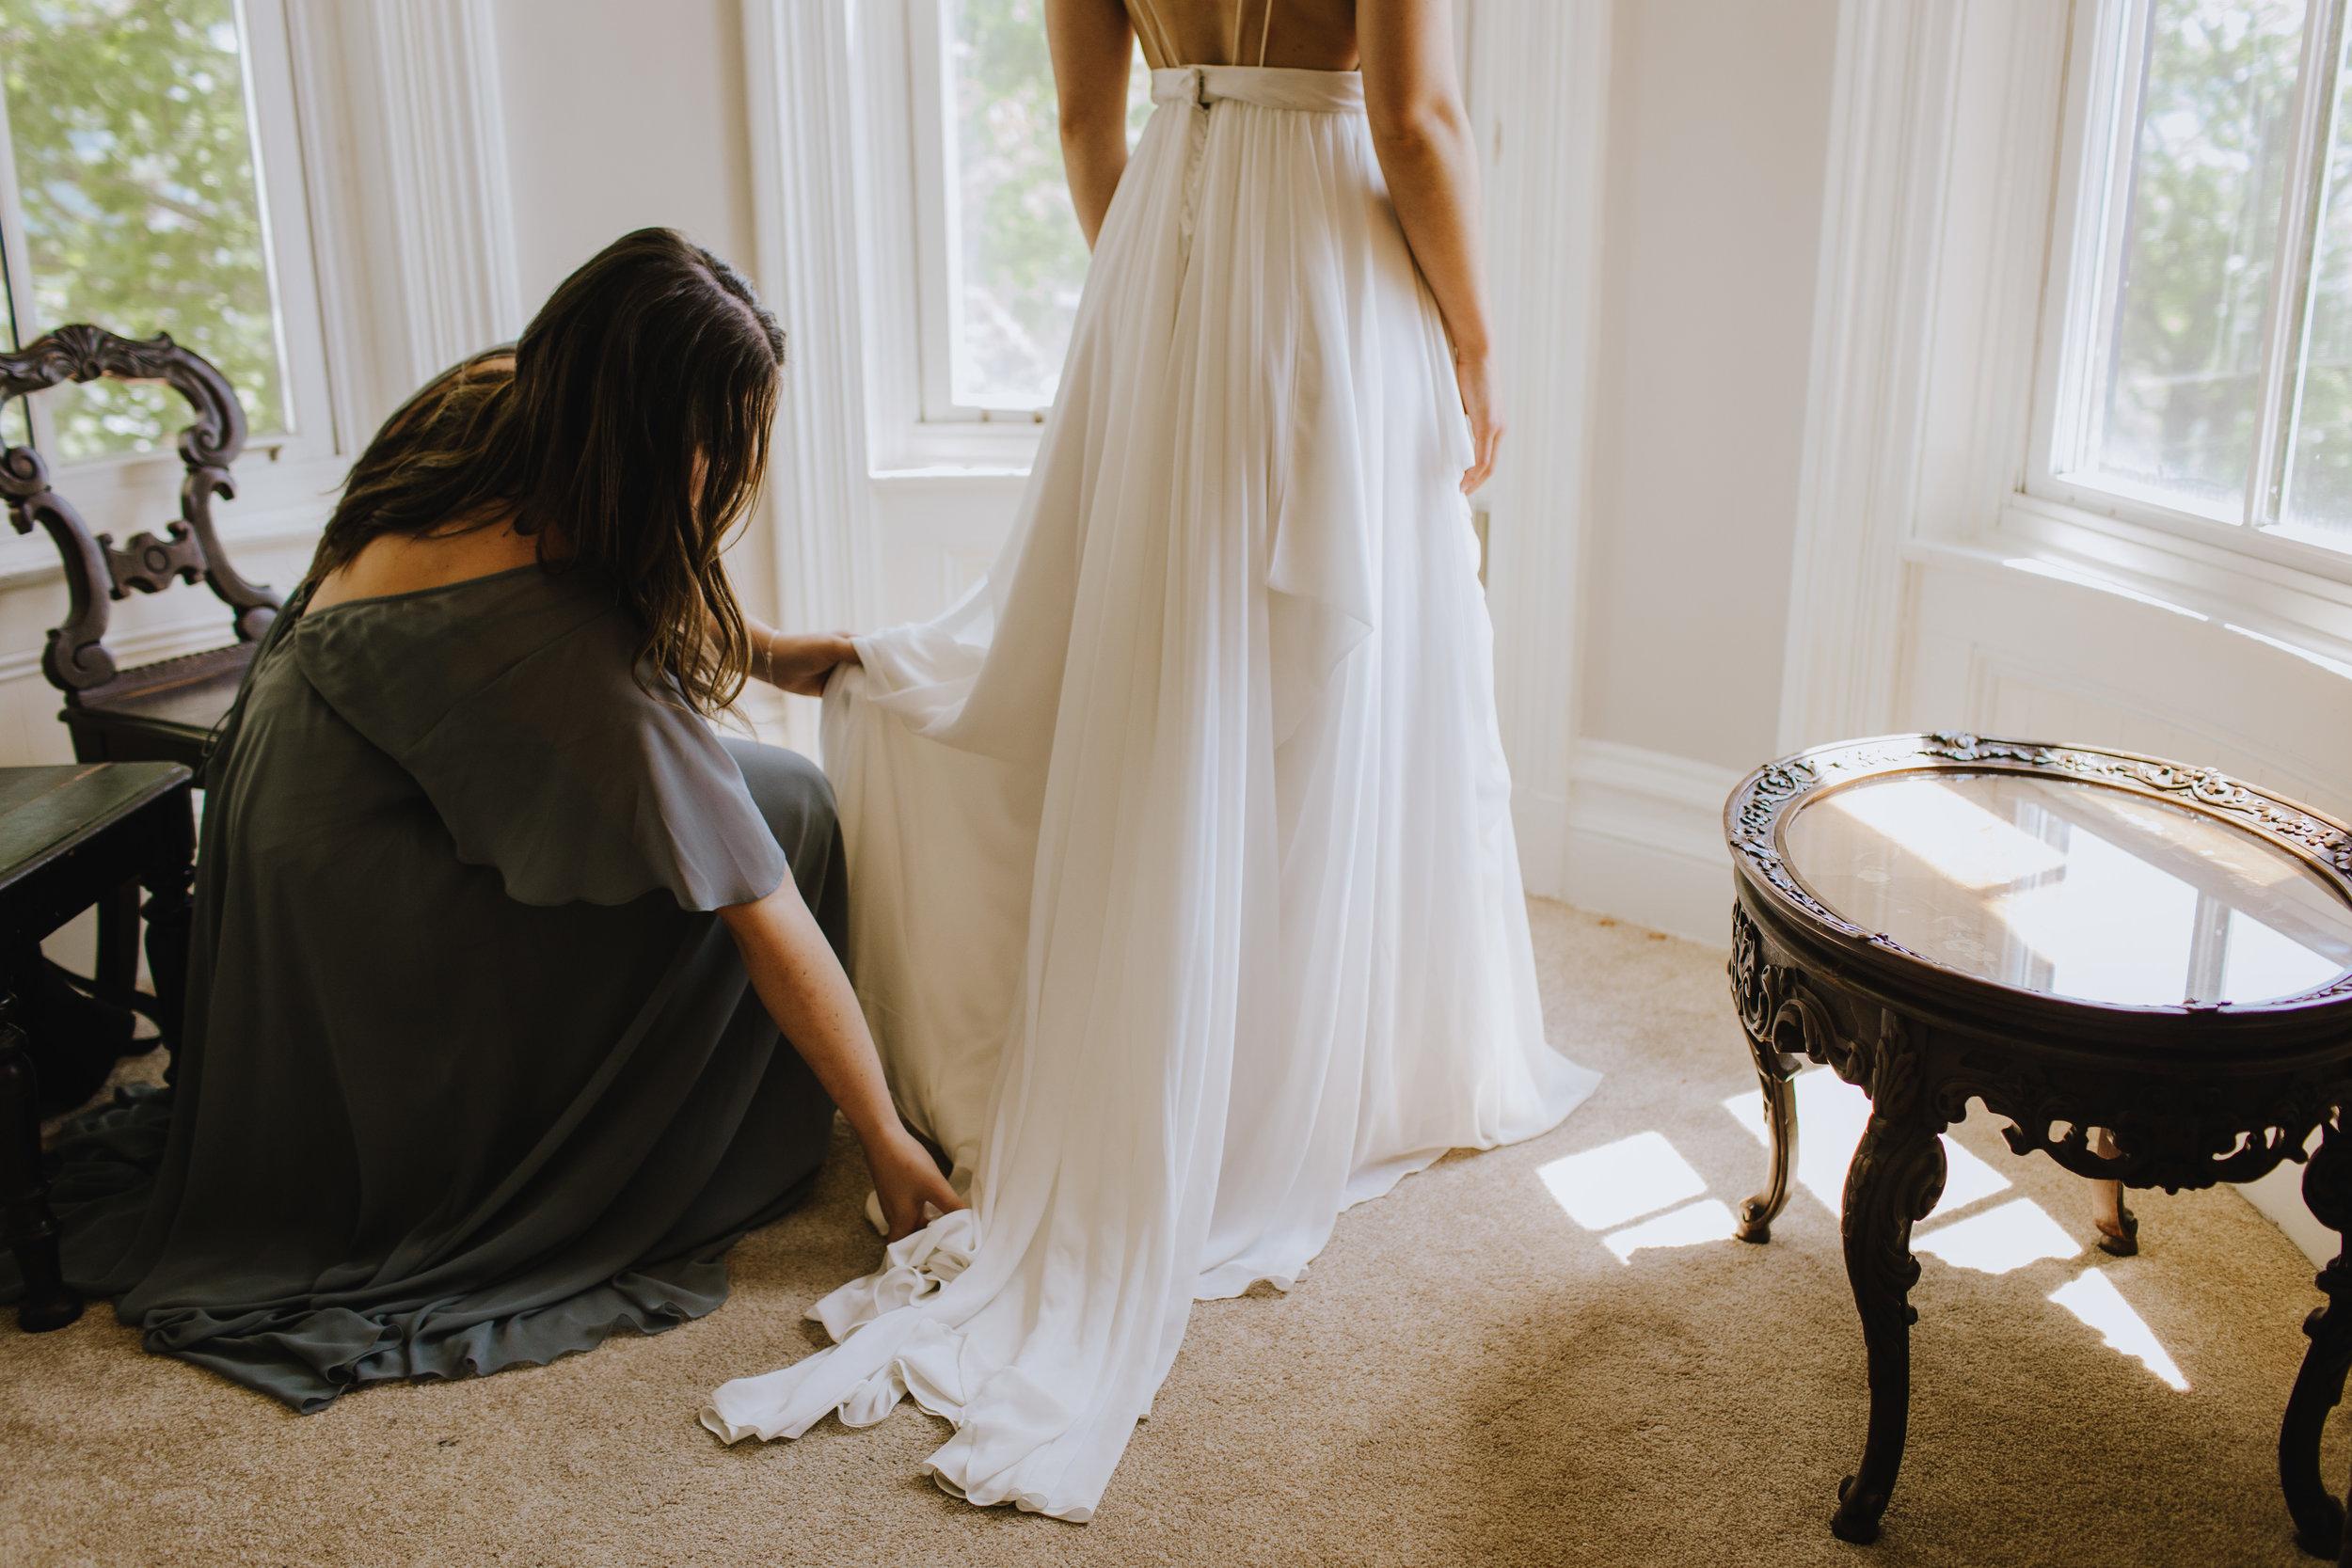 BOSCAWEN-INN-LUNENBURG-WEDDING-DAVE-AND-PRING-PHOTOGRAPHY-SOUTH-SHORE-LUNENBURG-BLUE-NOSE-WEDDING-DRESS-TRUVELLE-BRIDE